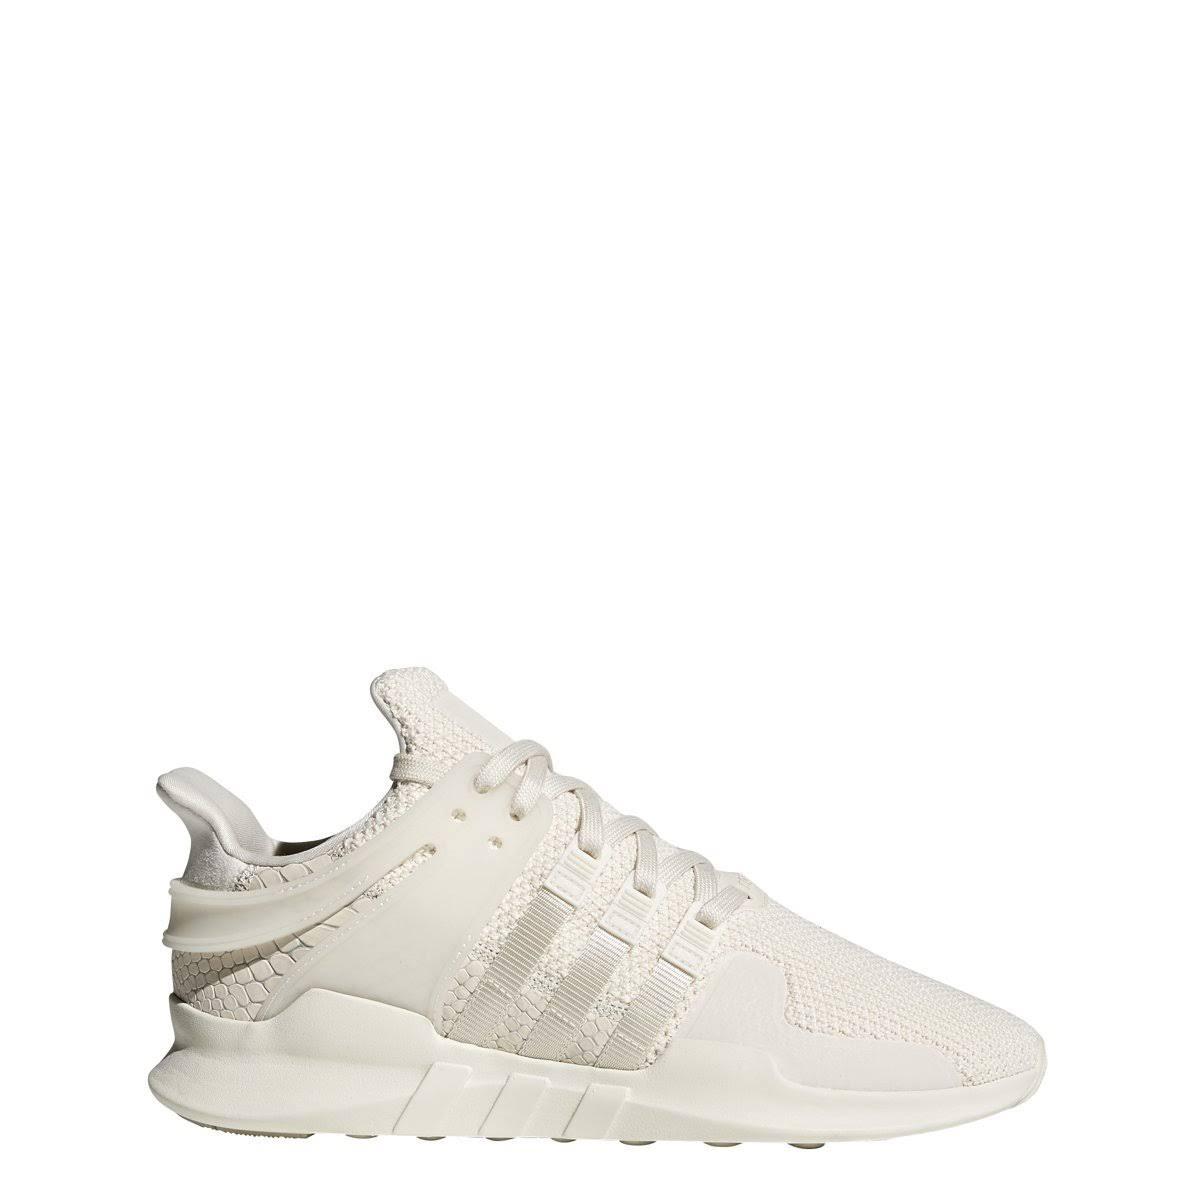 Support Zapatos White By9586 Chalk Para Originals Off 9 Eqt Tamaño Hombre Adv Adidas ZnxOw